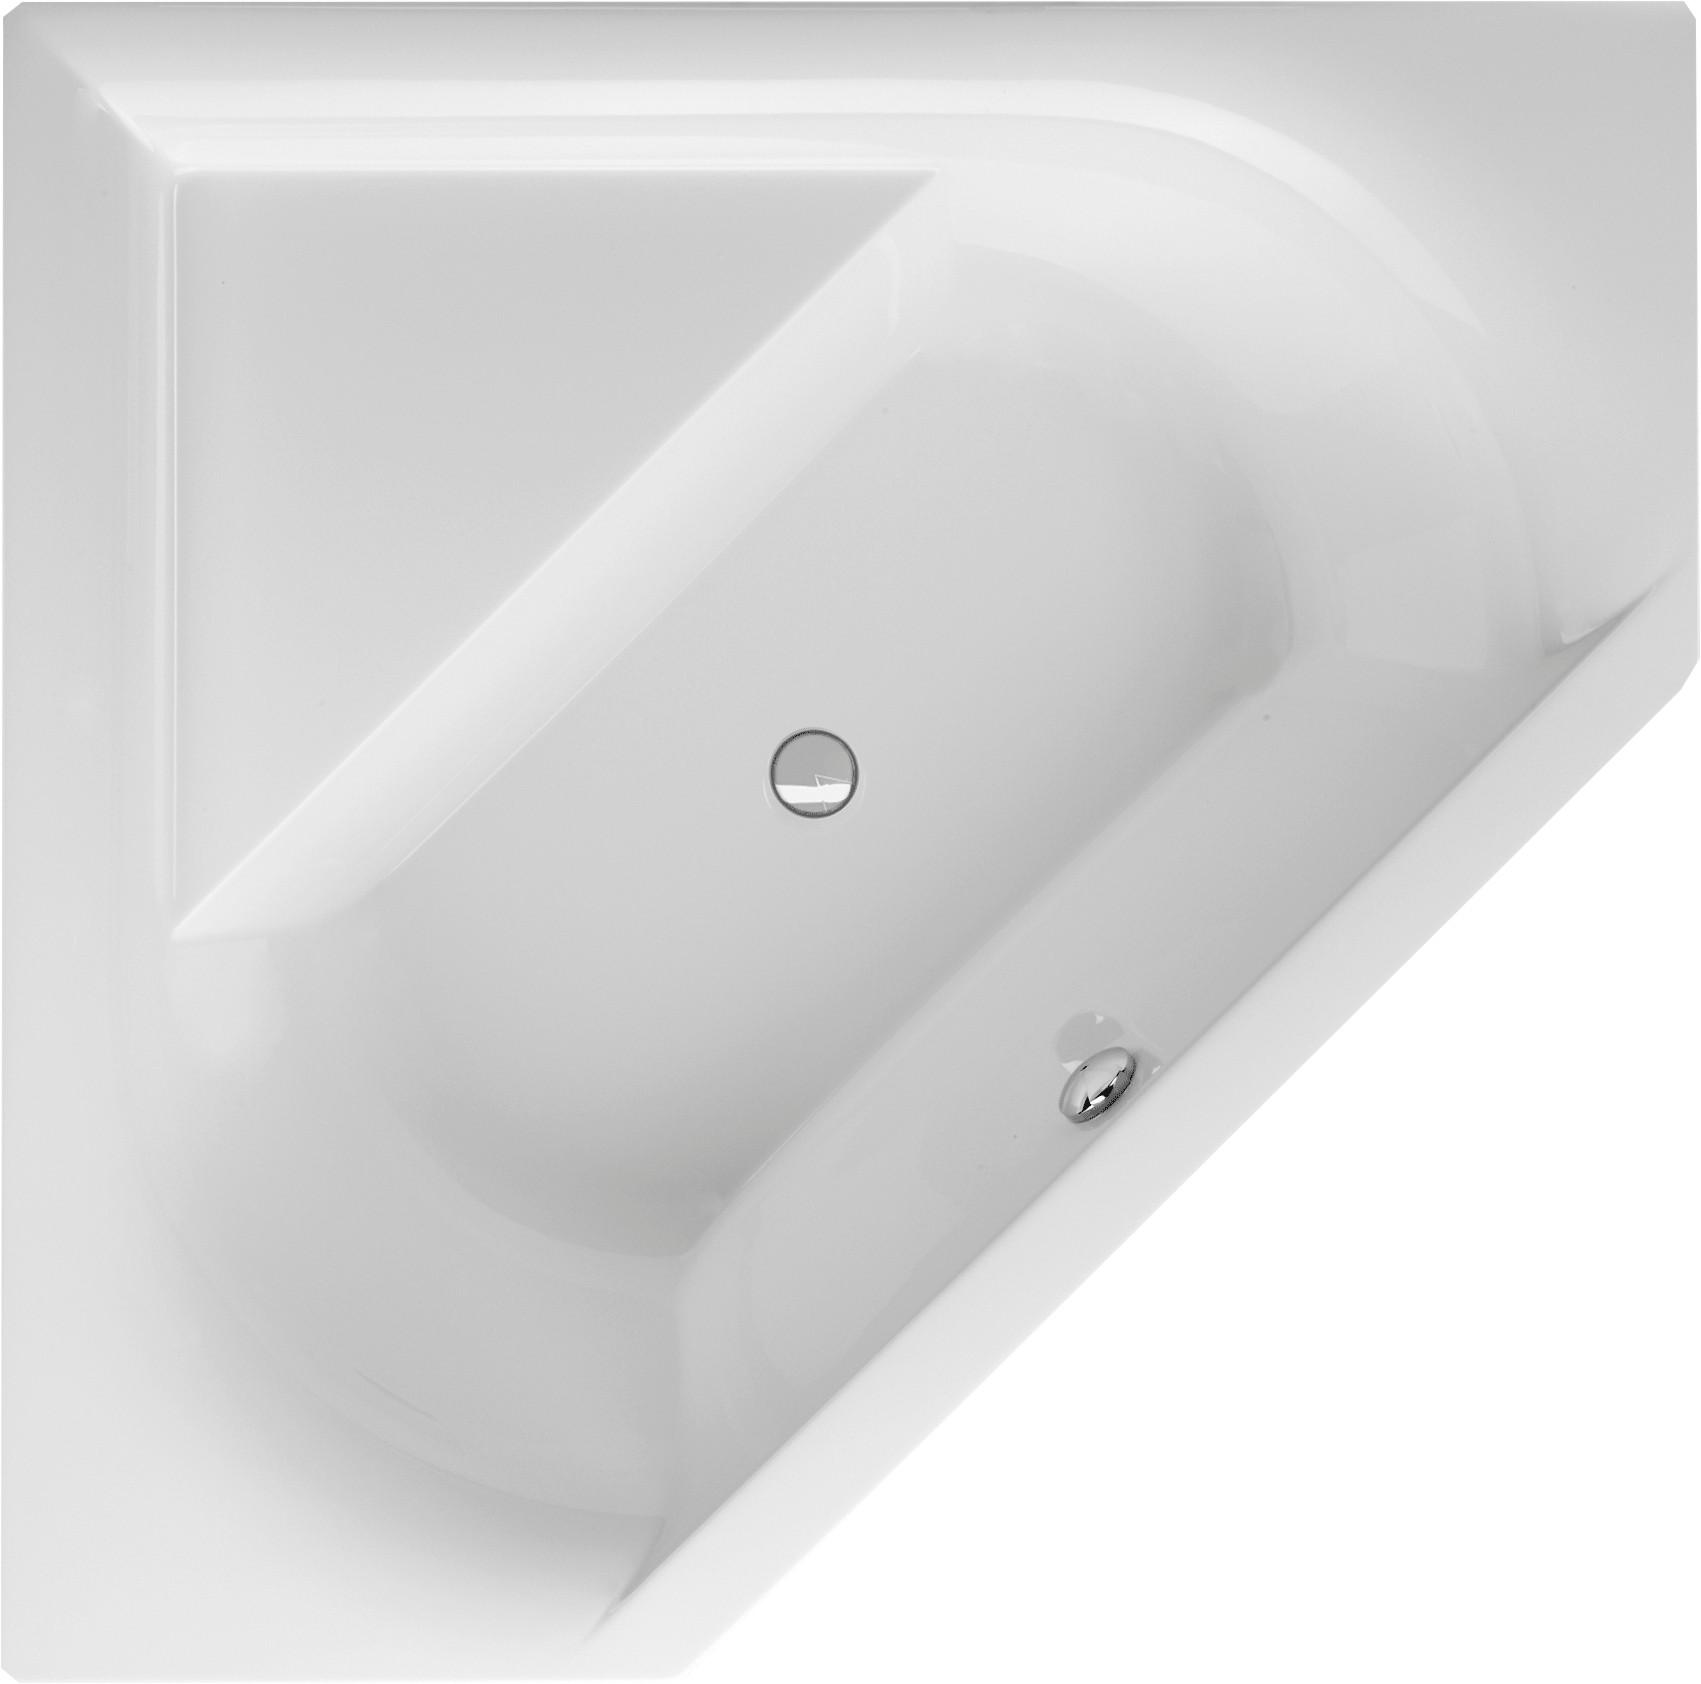 eckwanne 150 x 150 x 46 5 cm wei badewanne badewanne. Black Bedroom Furniture Sets. Home Design Ideas